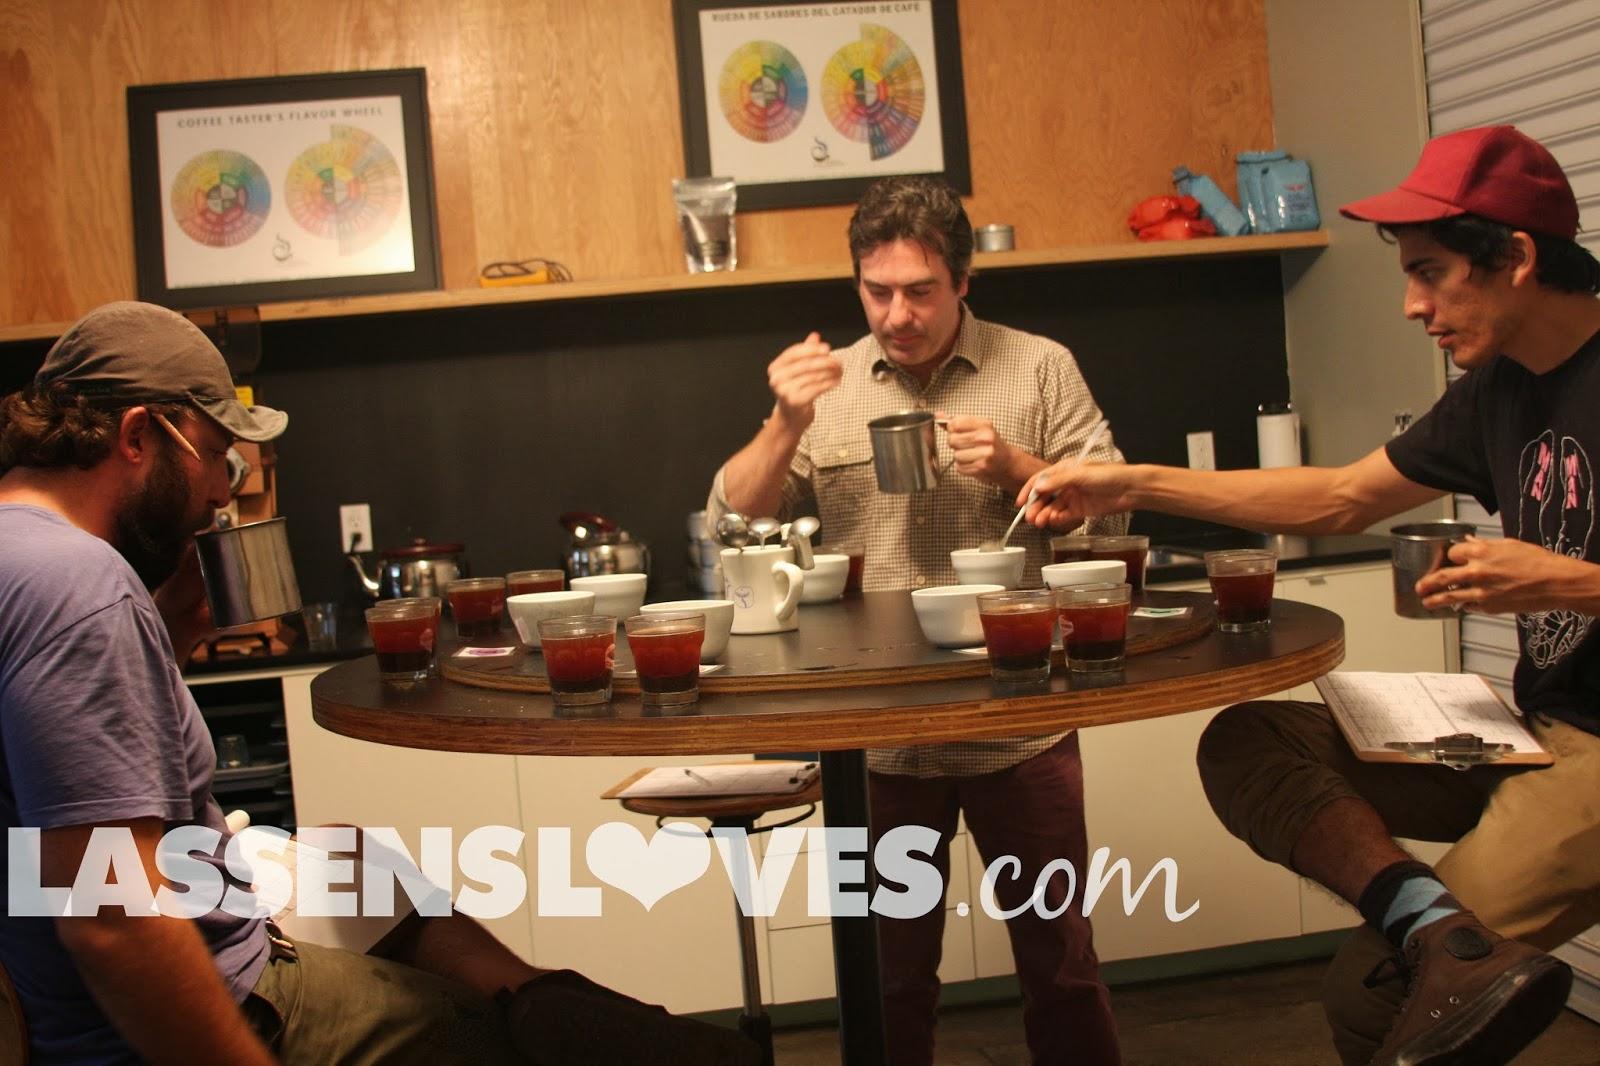 lassensloves.com, Lassen's, Intelligensia+Coffee, Coffee+Roasting, Coffee+tasting, Coffee+Cupping